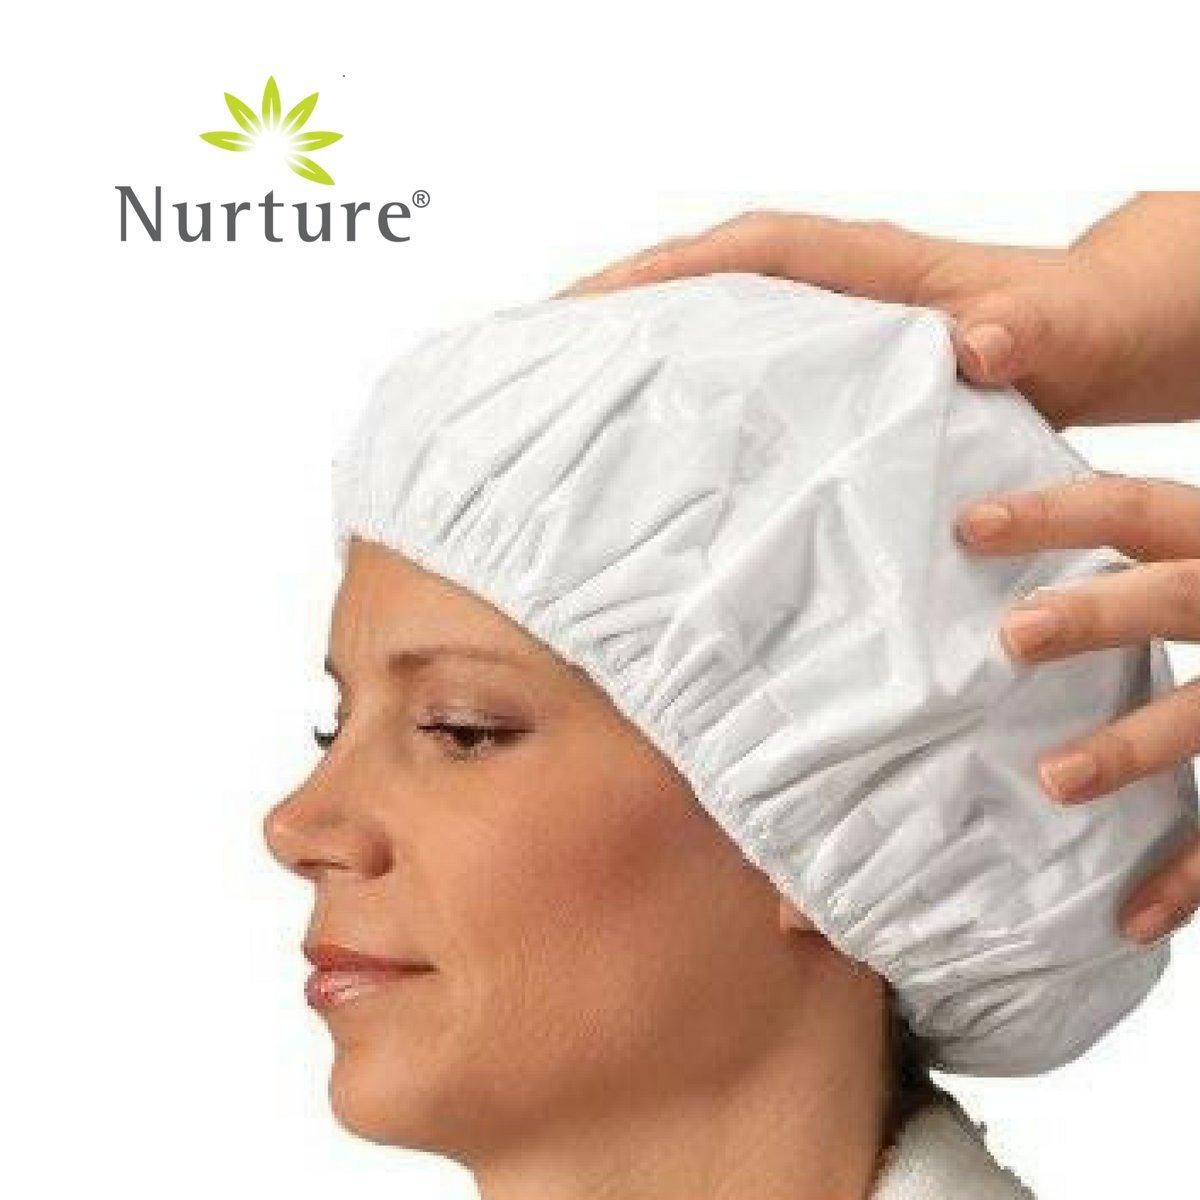 No Rinse Shampoo Cap by Nurture (24 Pack) | Rinse Free Shower Cap That Shampoos & Conditions - PH Balanced & Hypoallergenic by Nurture (Image #4)